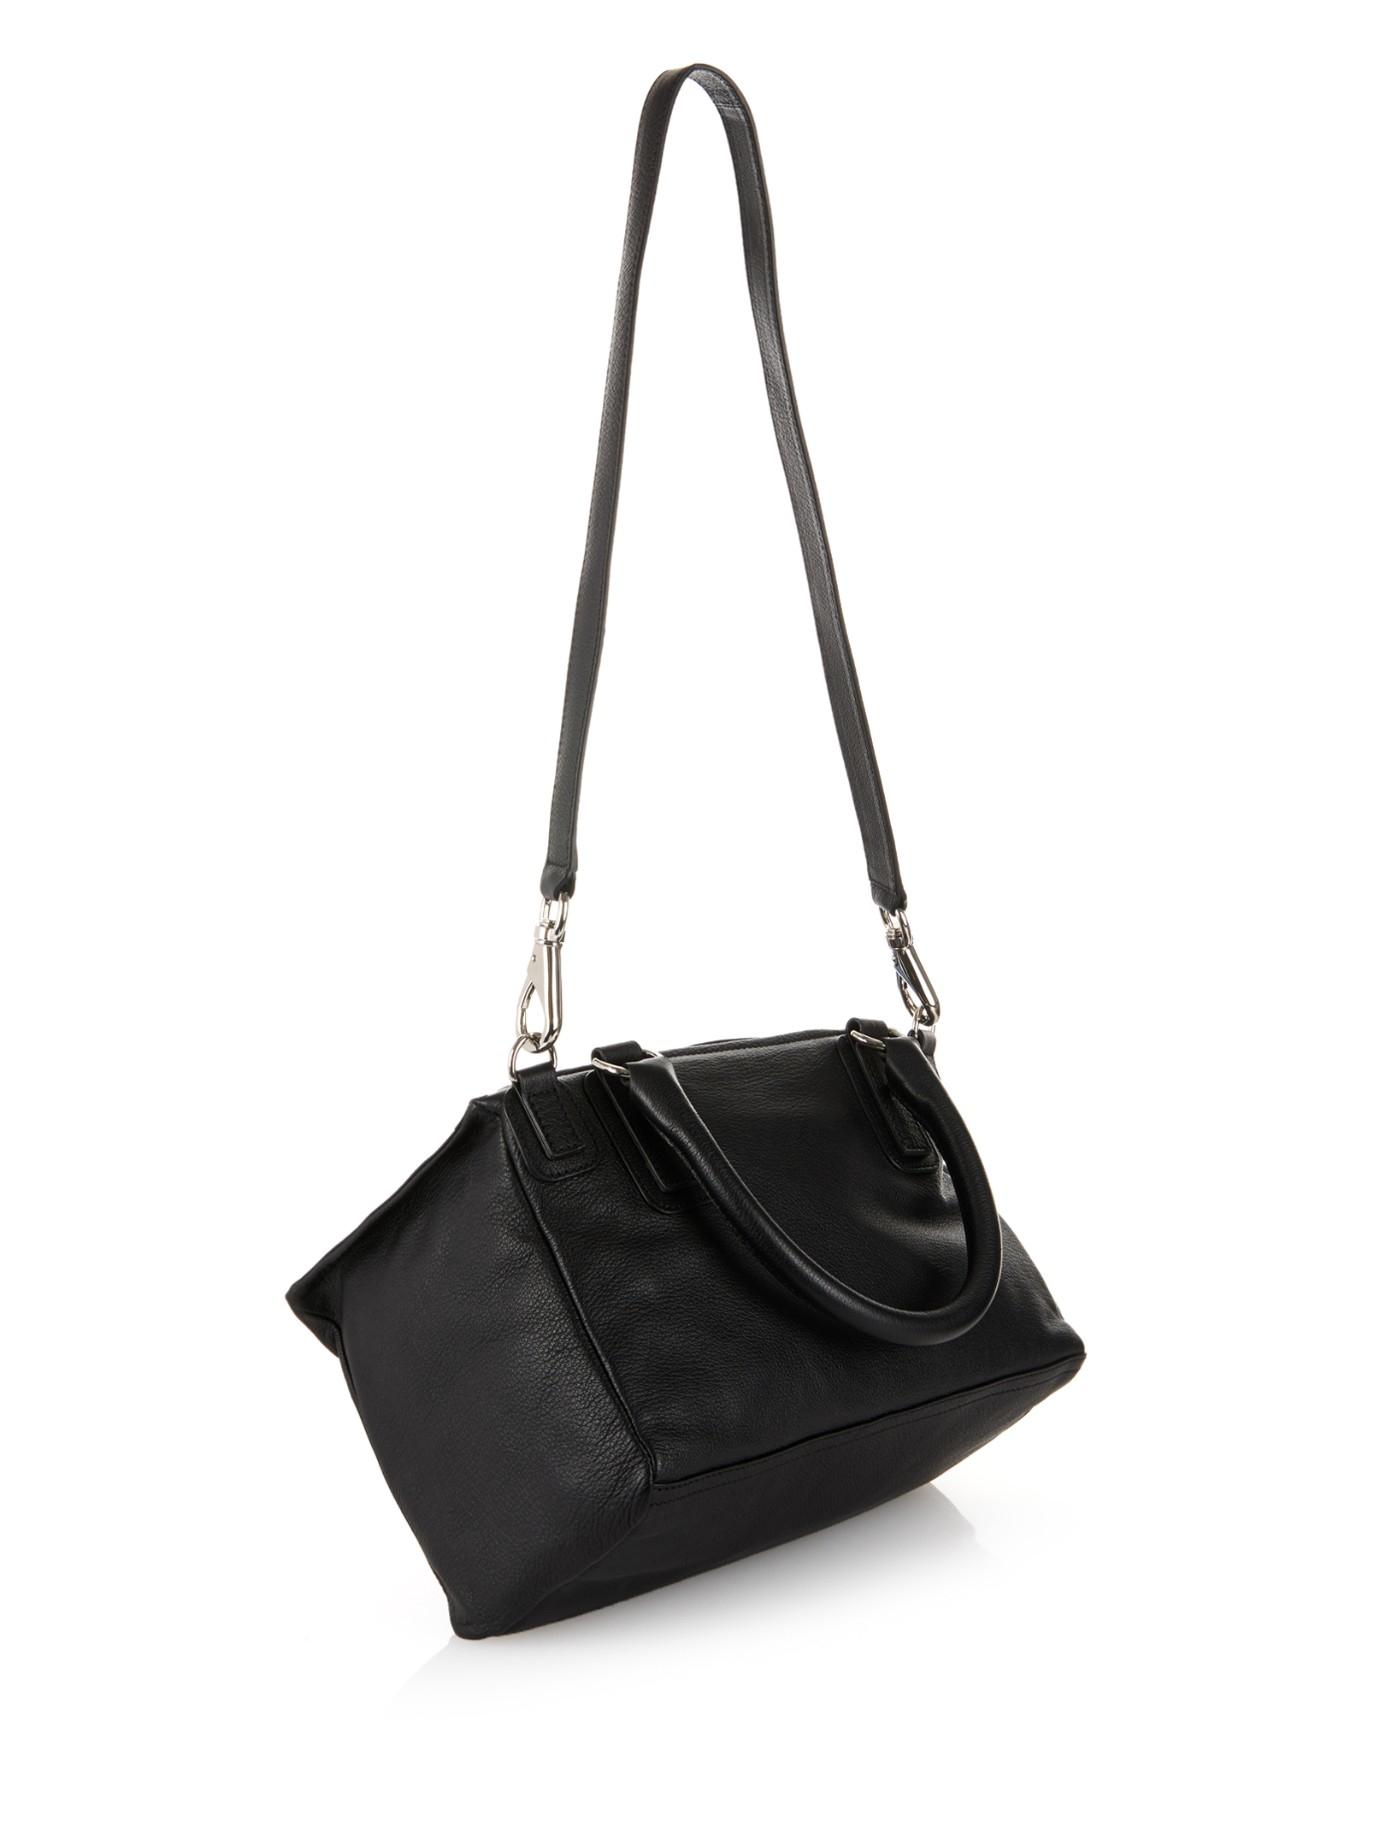 309de8cfc9a6 Lyst - Givenchy Pandora Medium Sugar-leather Bag in Black